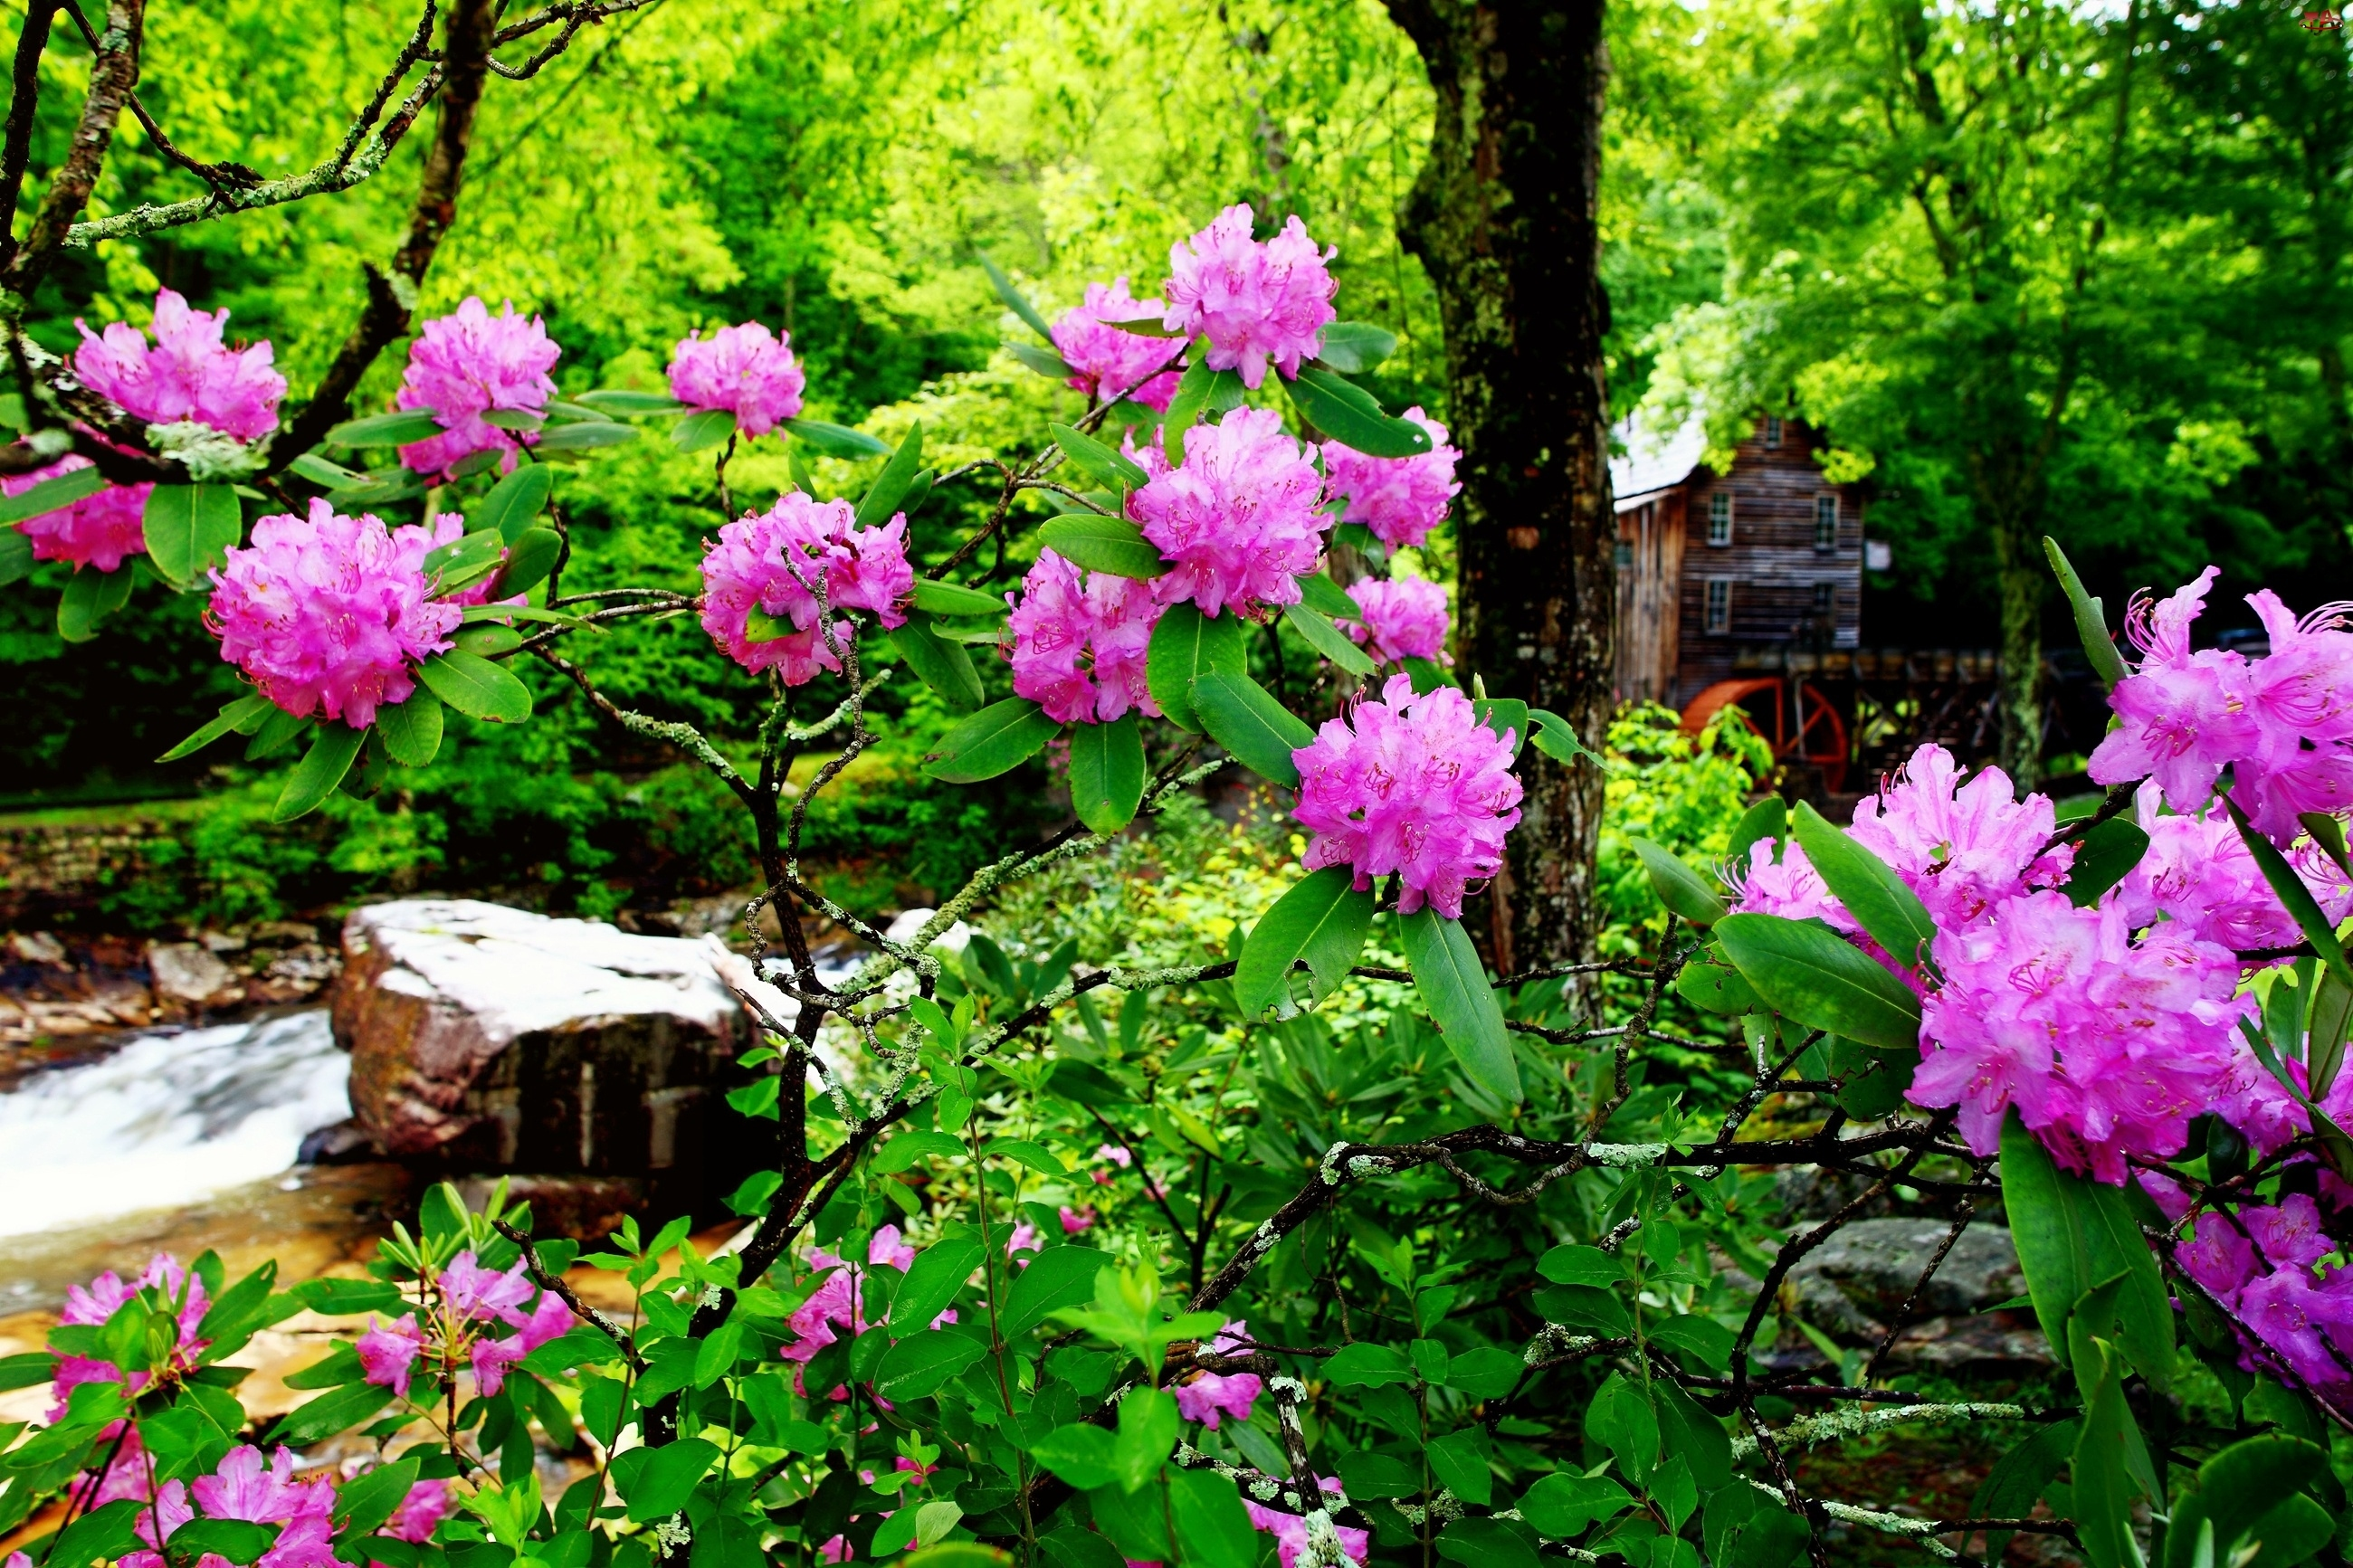 Wodny, Kwitnące, Las, Rododendrony, Młyn, Strumyk